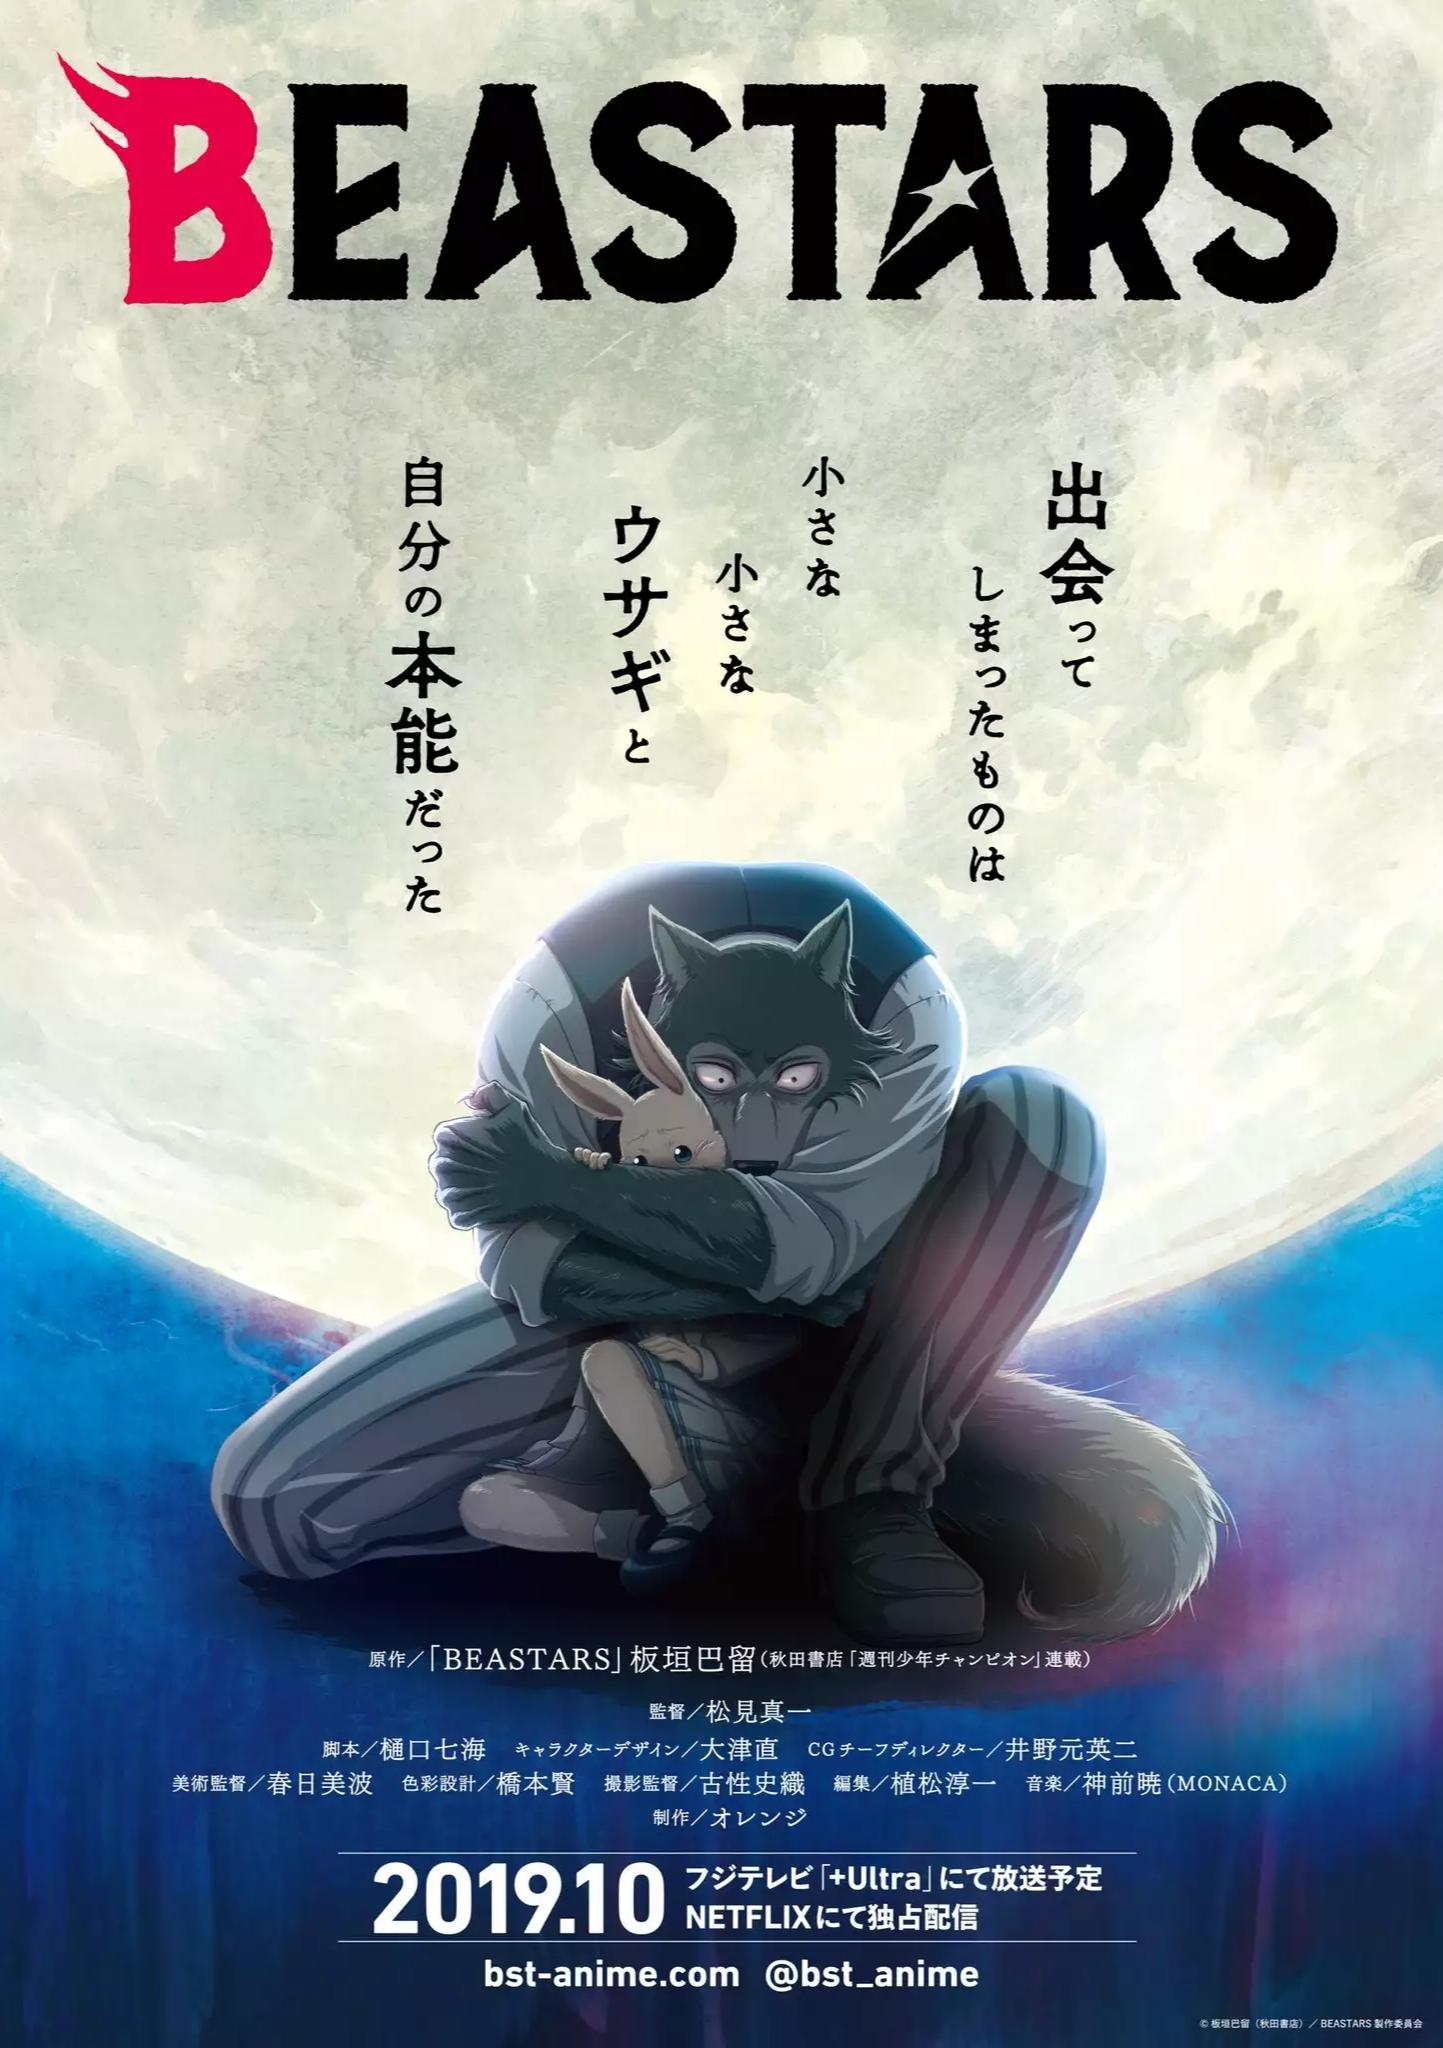 Resultado de imagen para beastars anime